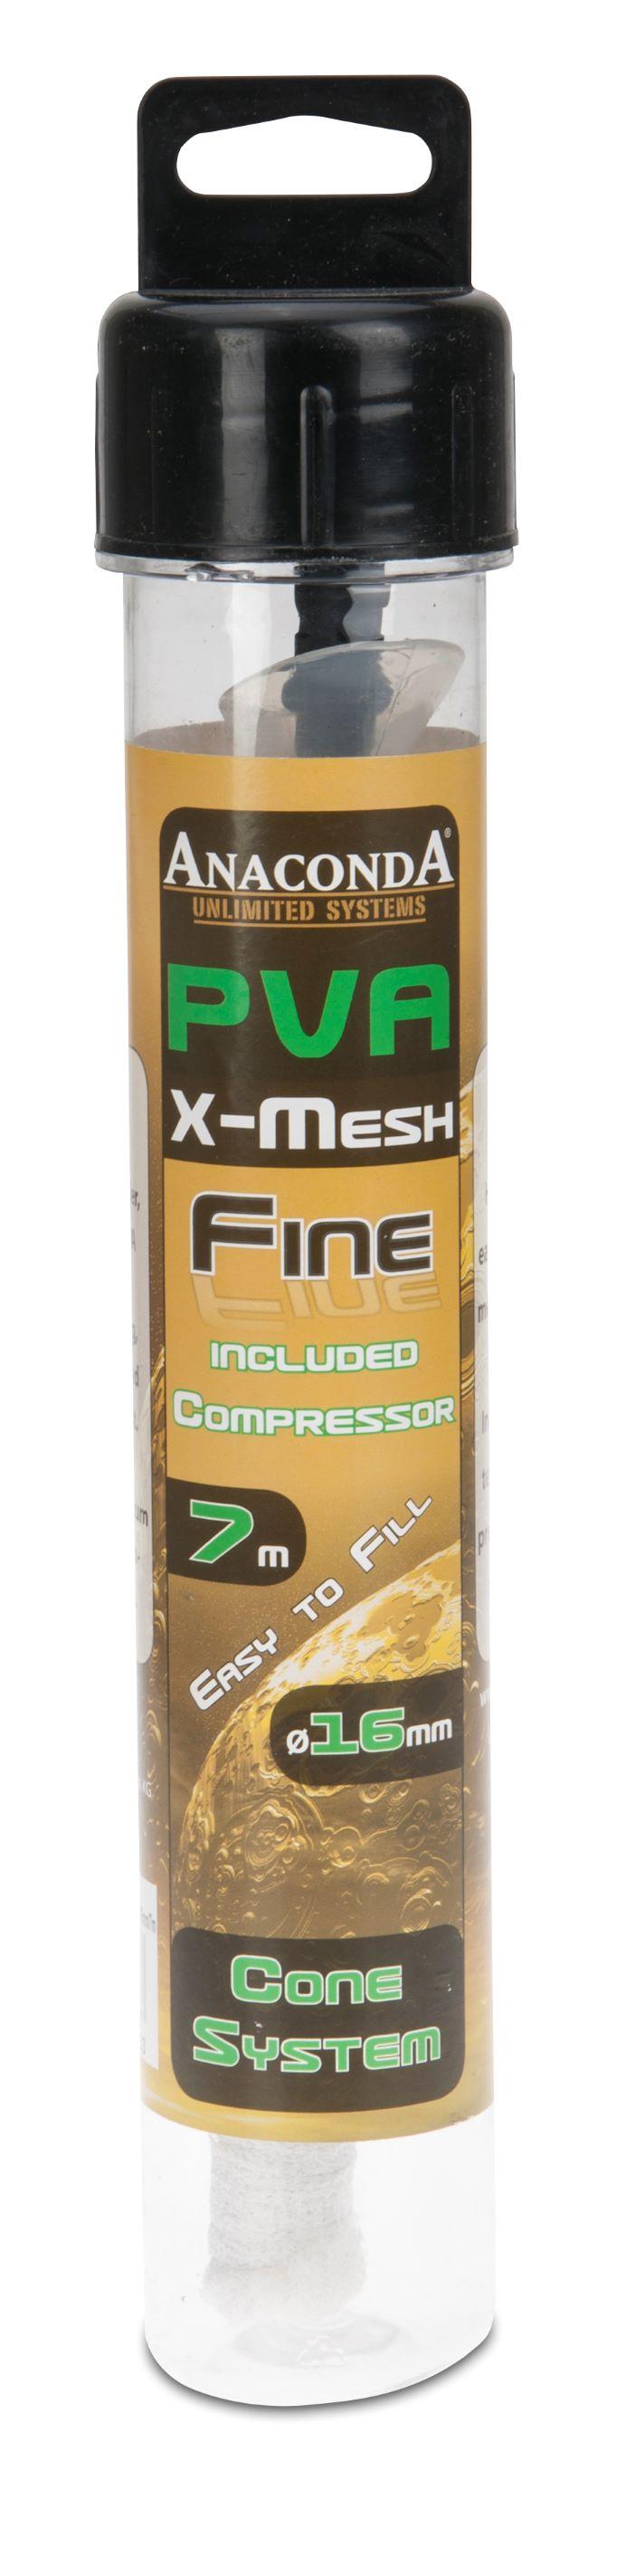 Anaconda PVA X-Mesh  průměr: 16 mm